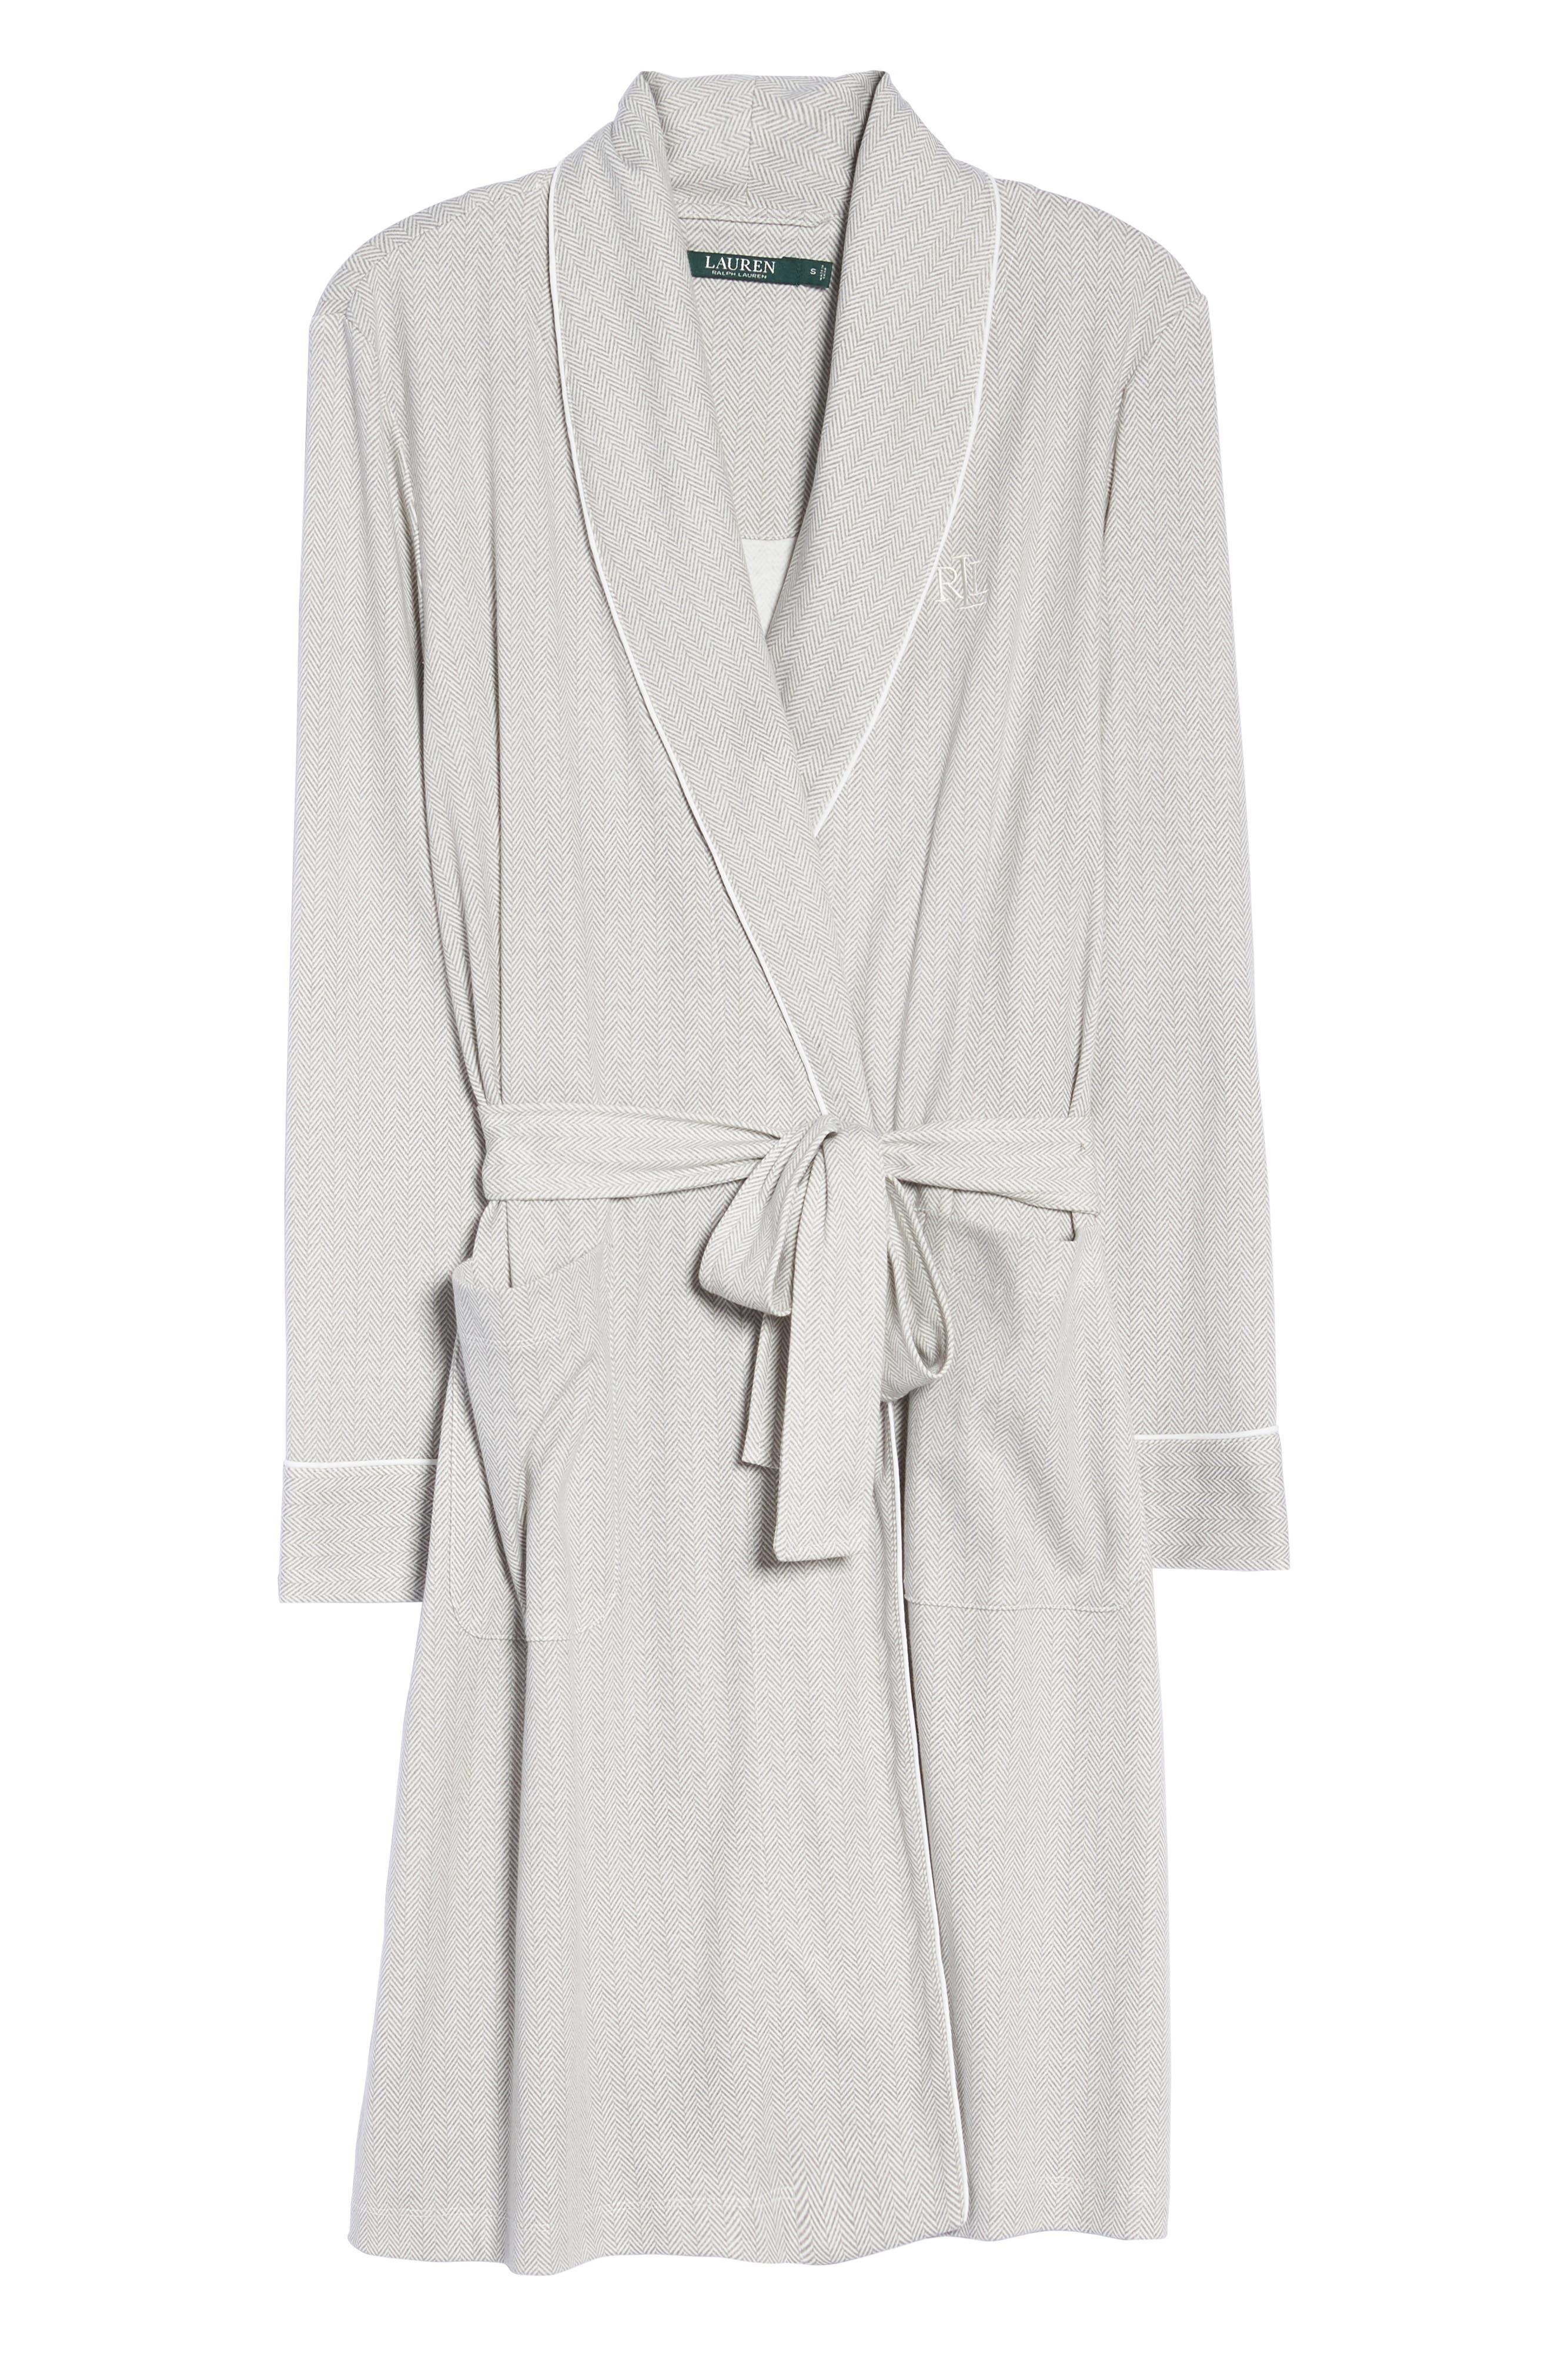 Short Robe,                             Alternate thumbnail 6, color,                             023